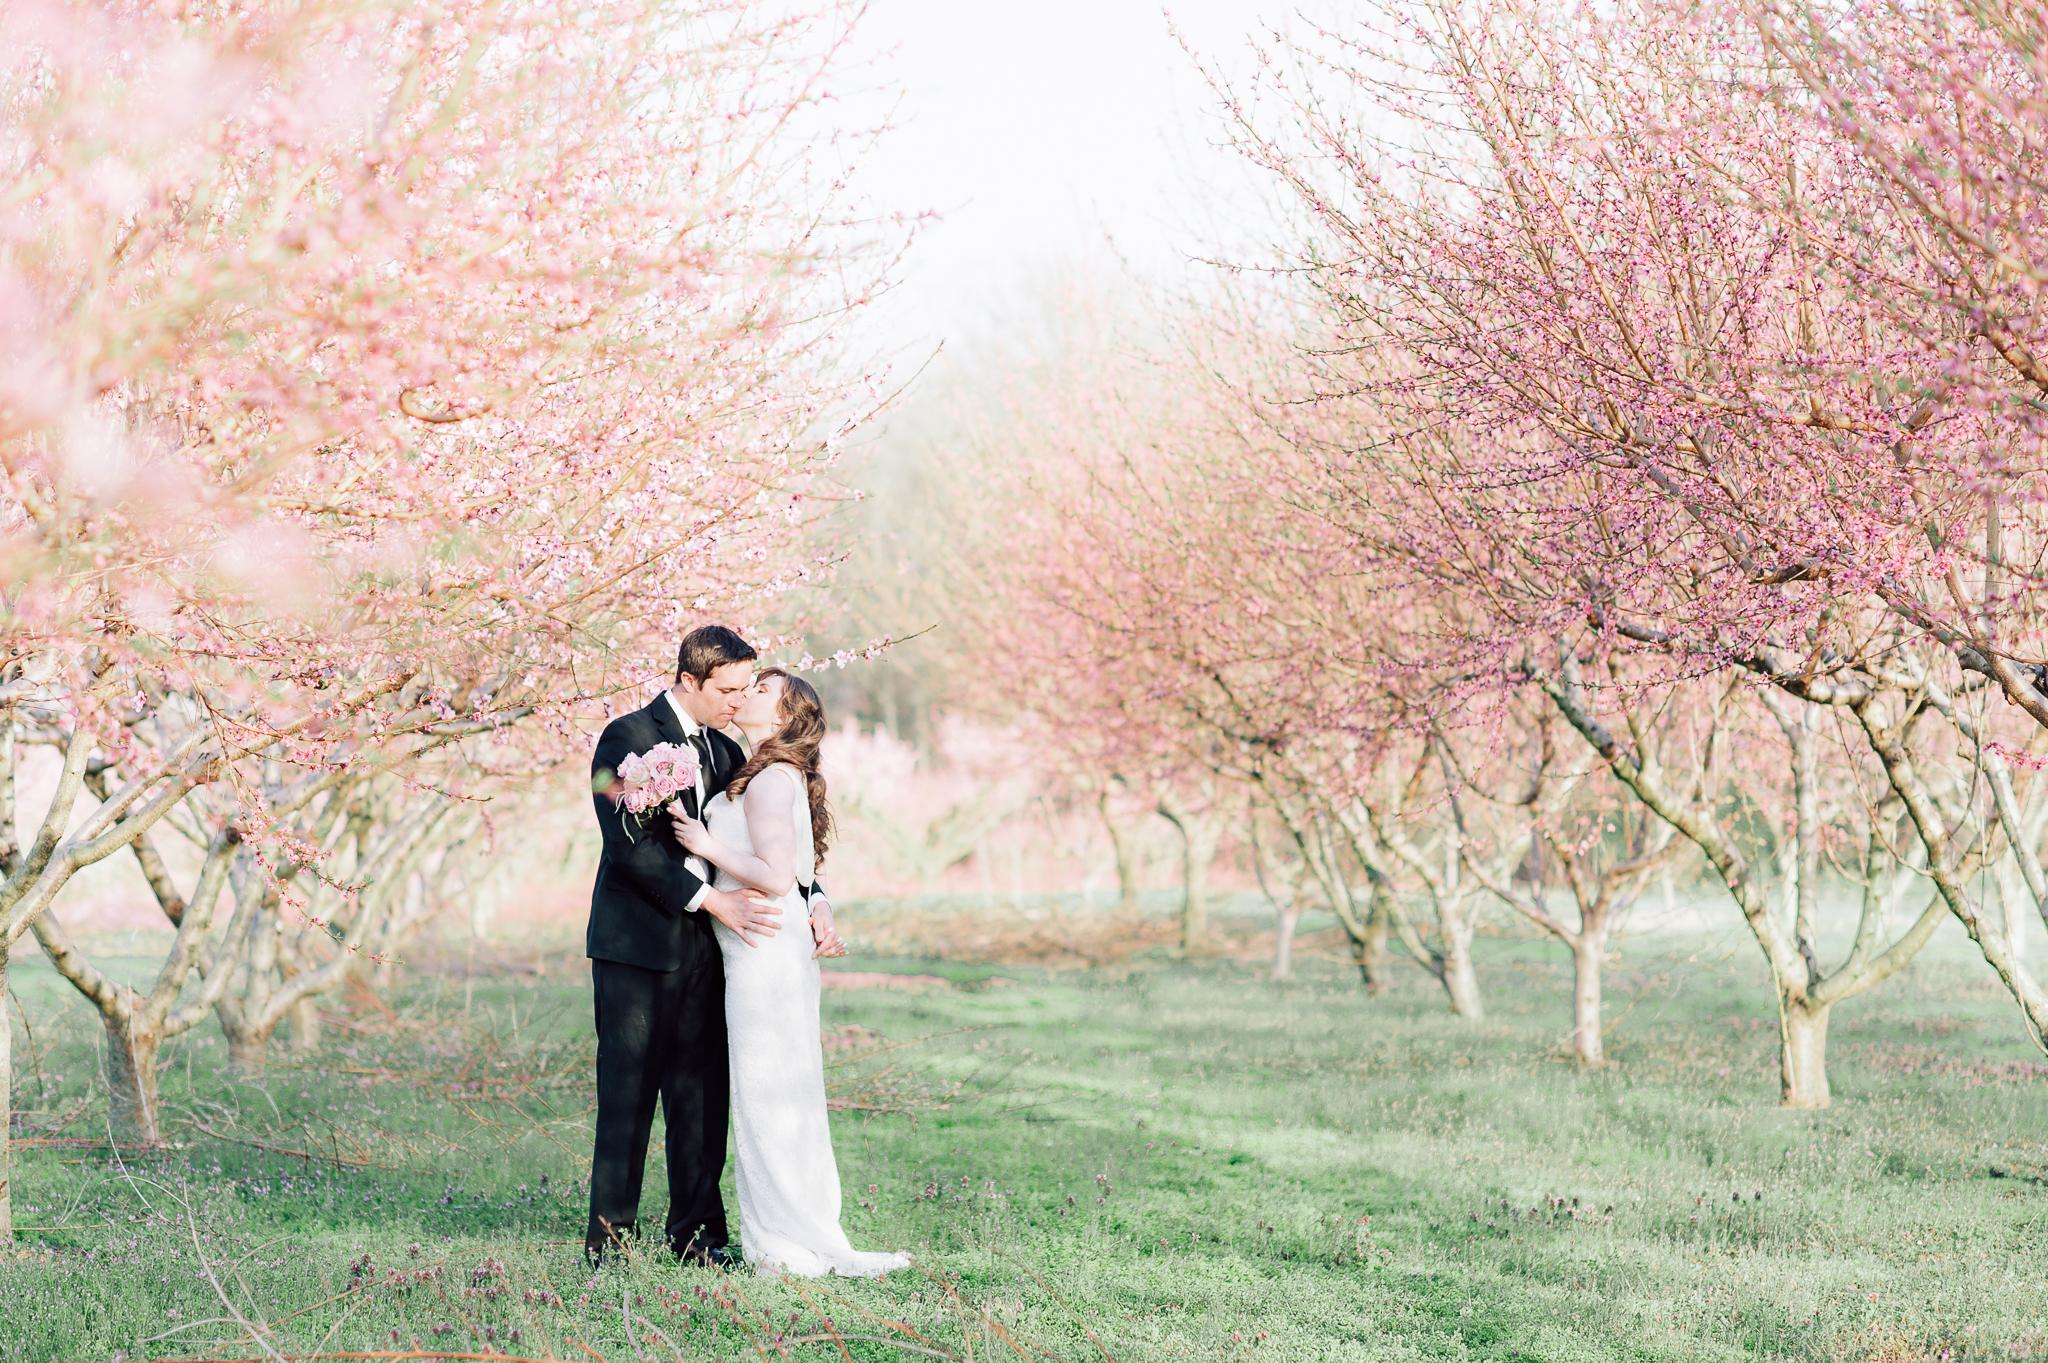 springwedding_cherryblossoms_virginiaphotographer_youseephotography_styledshoot (581).jpg